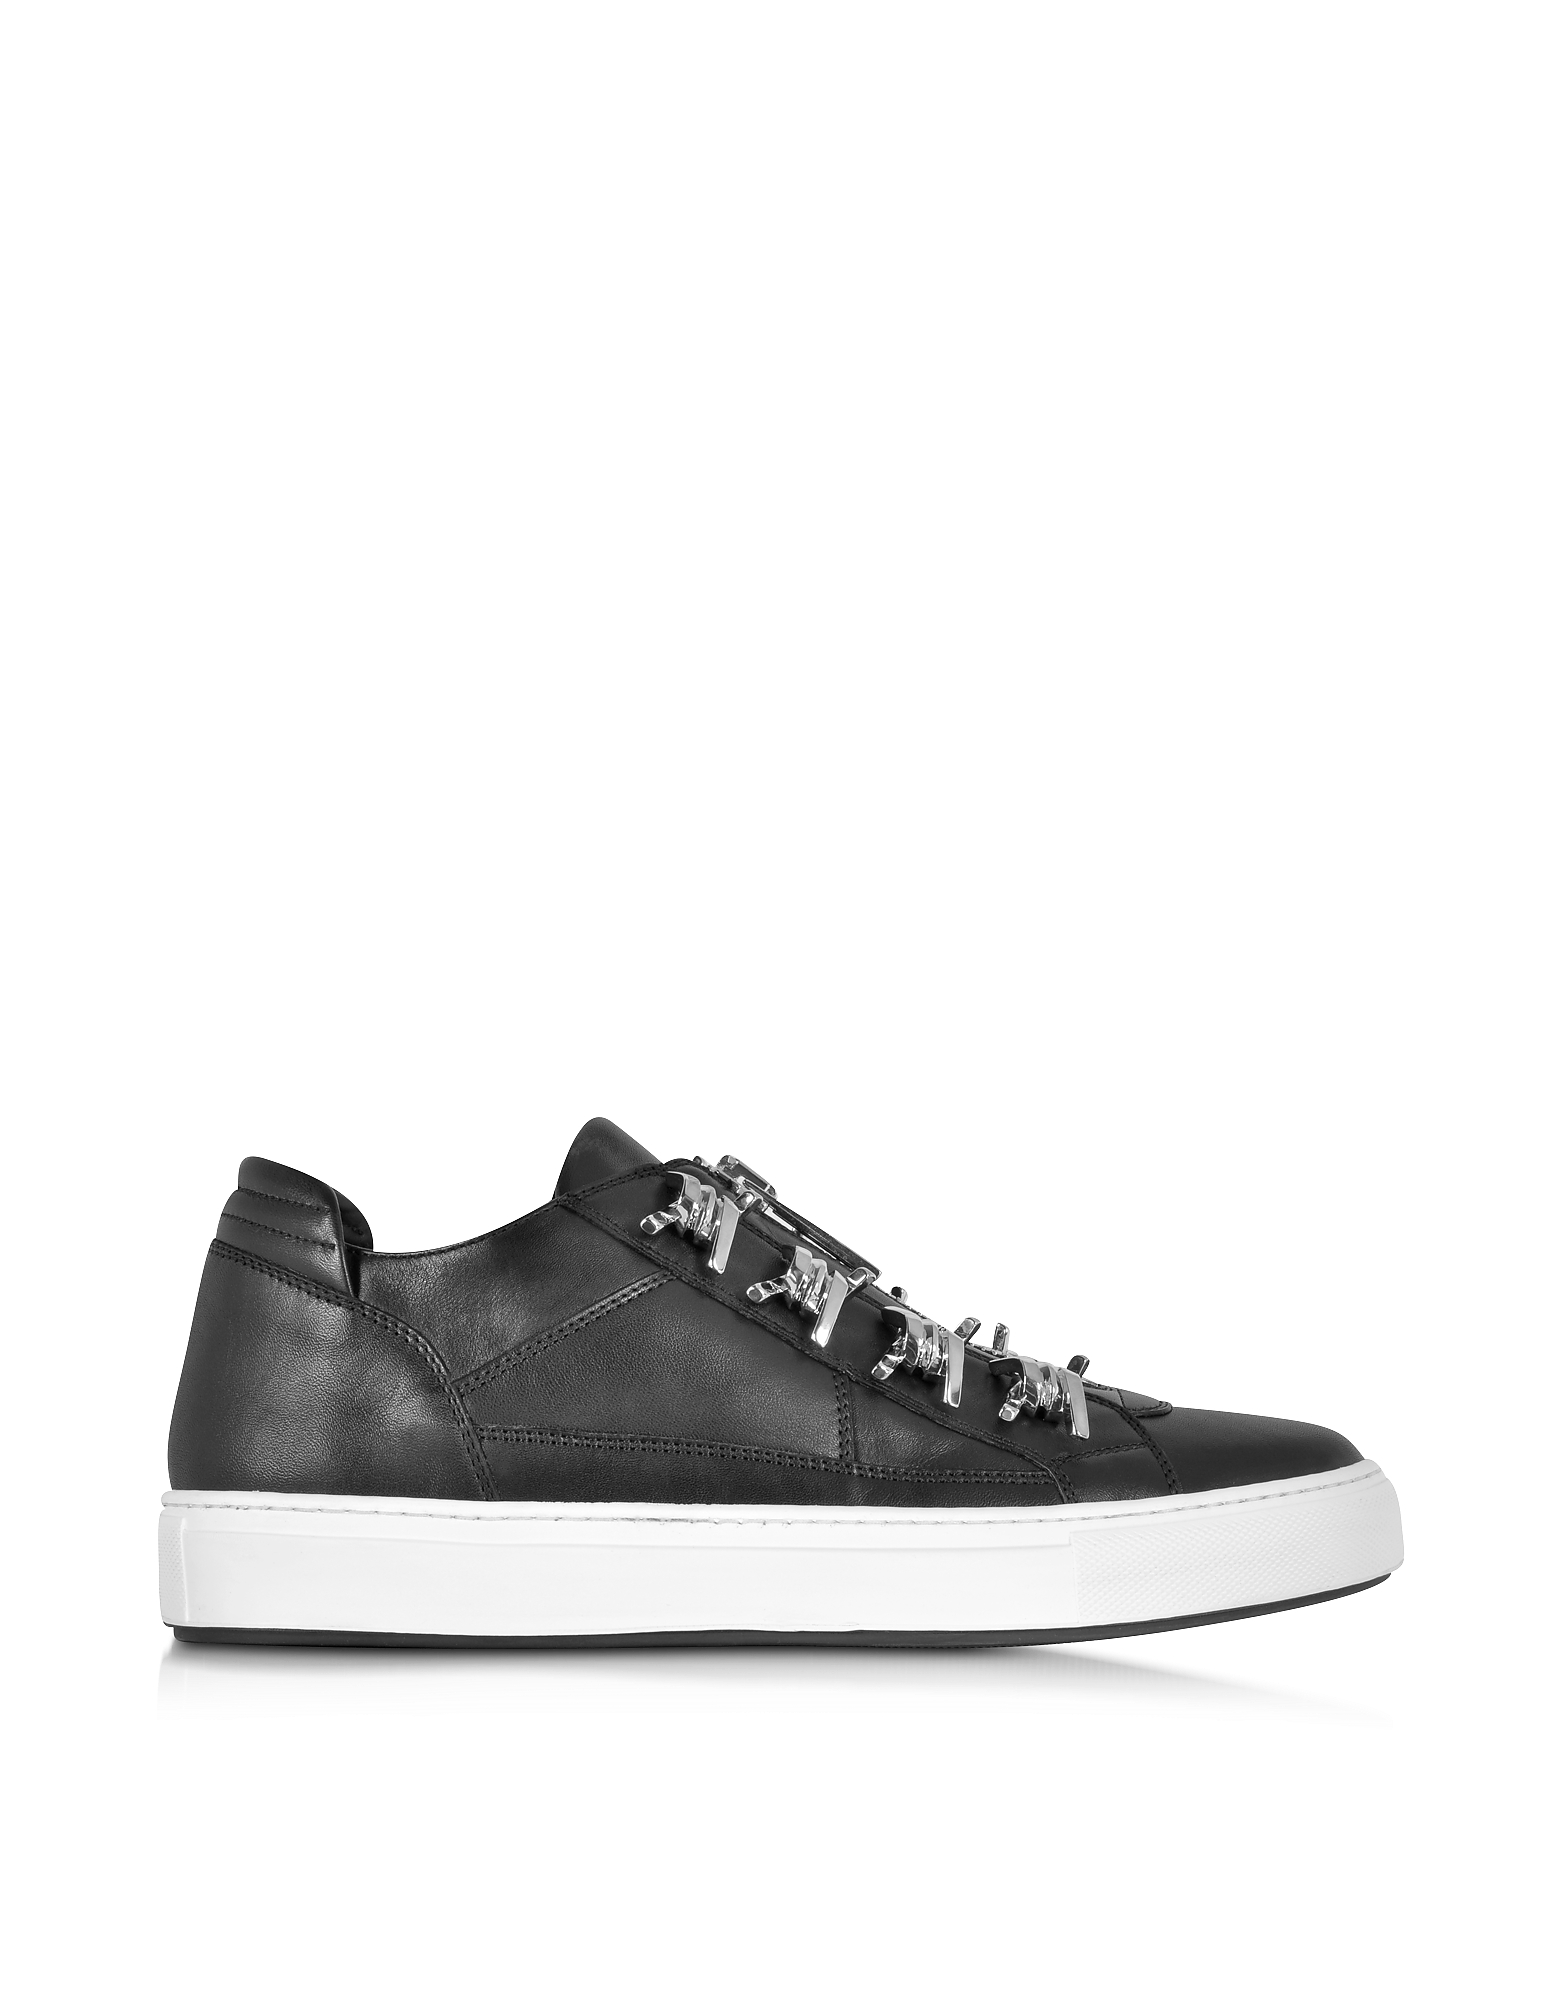 DSquared2 Shoes, Asylum Black Leather Men's Sneaker